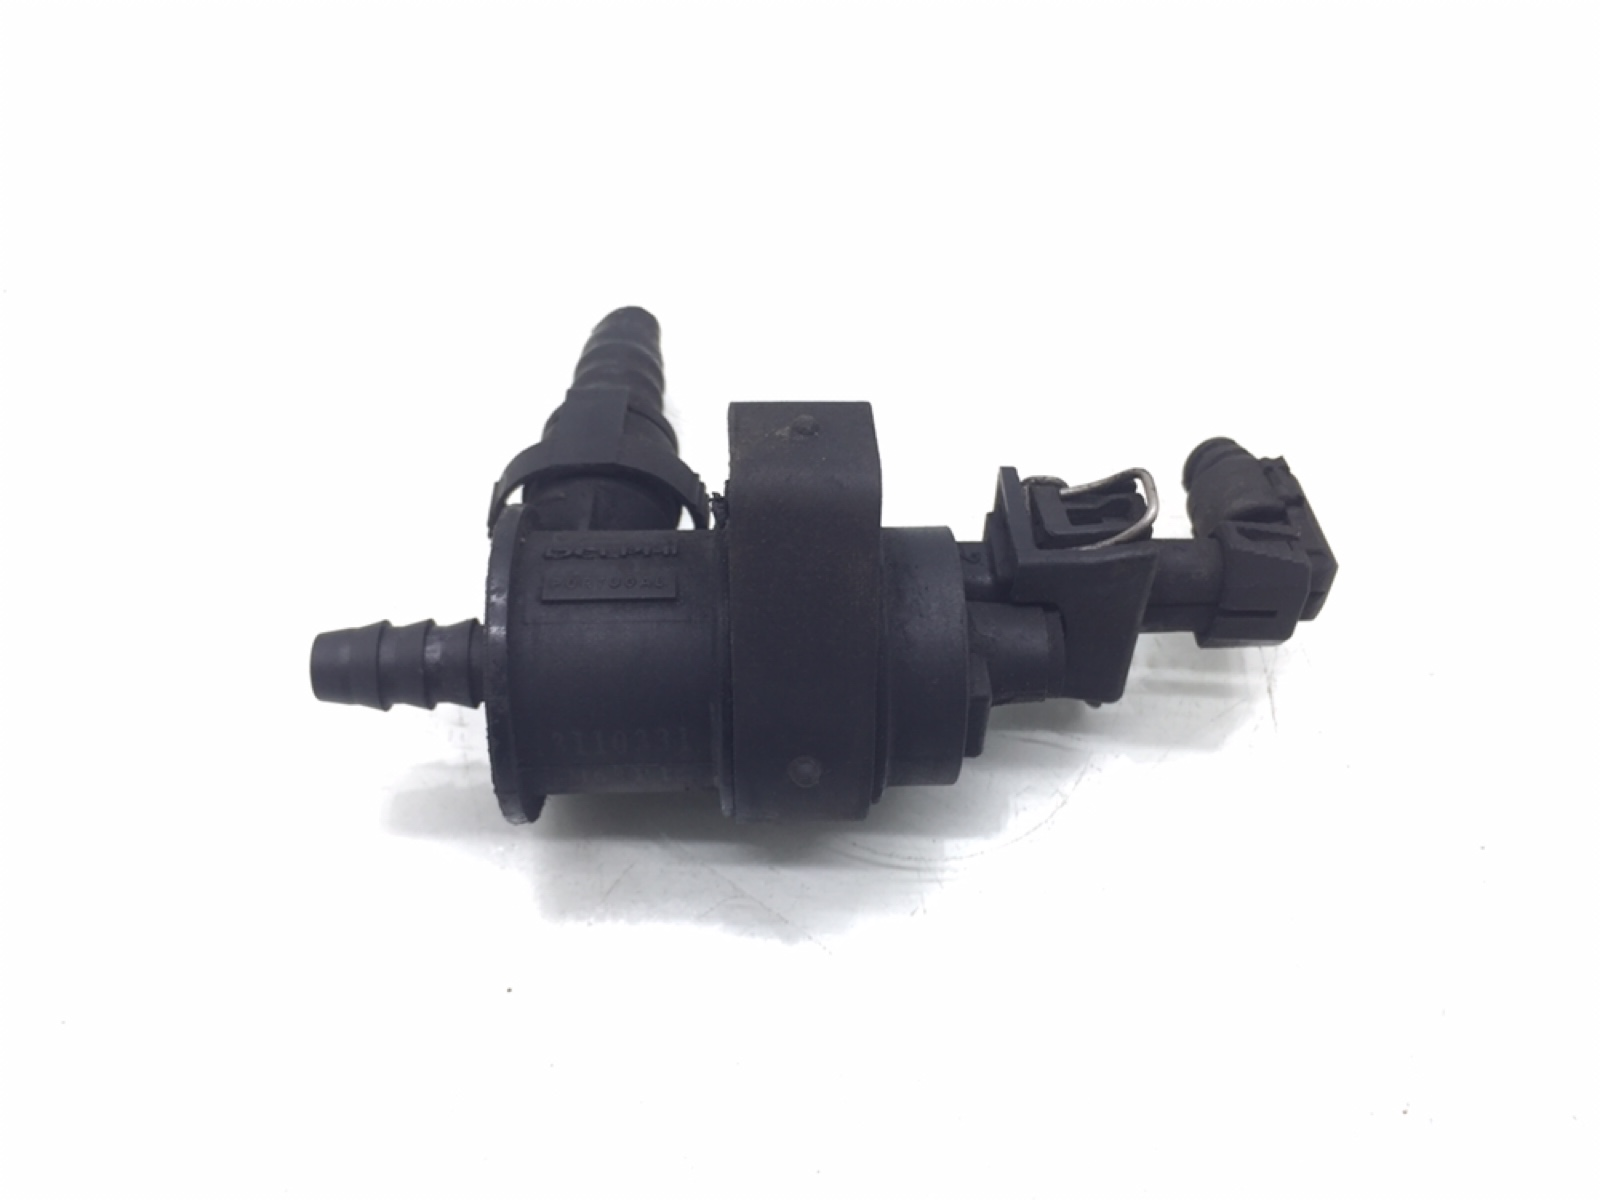 Клапан вентиляции топливного бака Opel Zafira B 1.6 I 2009 (б/у)